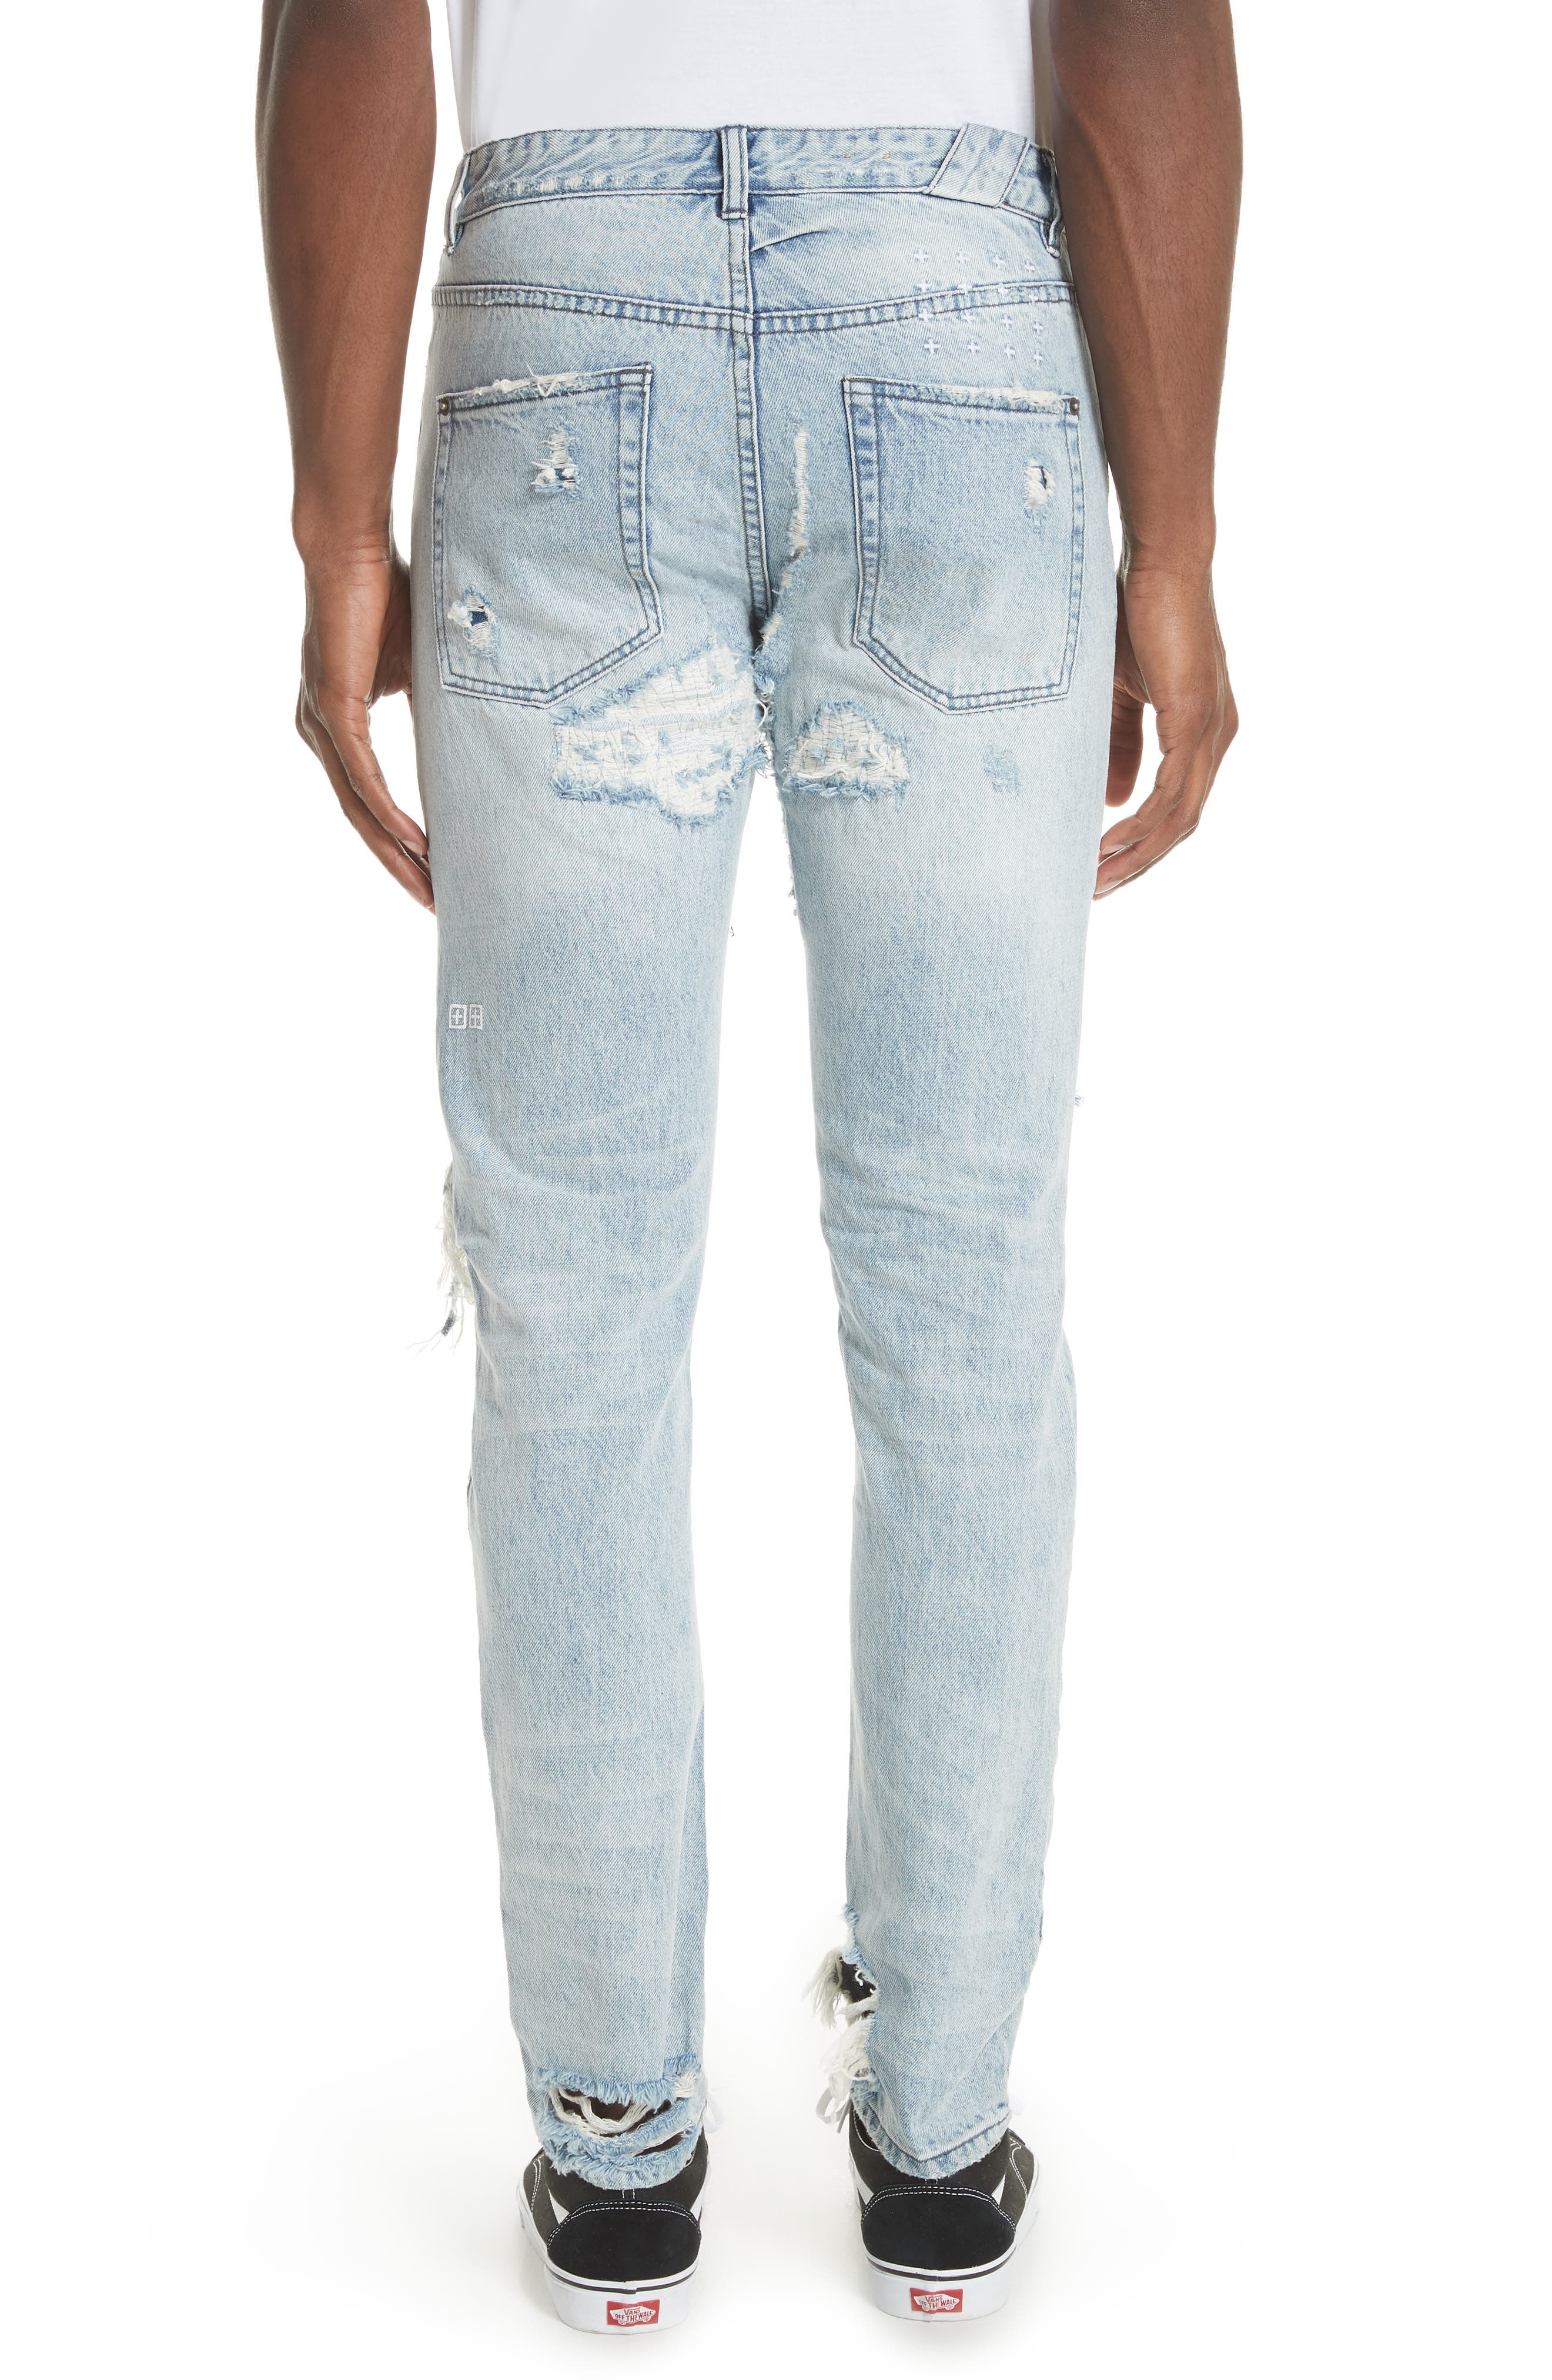 Chitch Tropo Trash Jeans,                             Alternate thumbnail 2, color,                             400